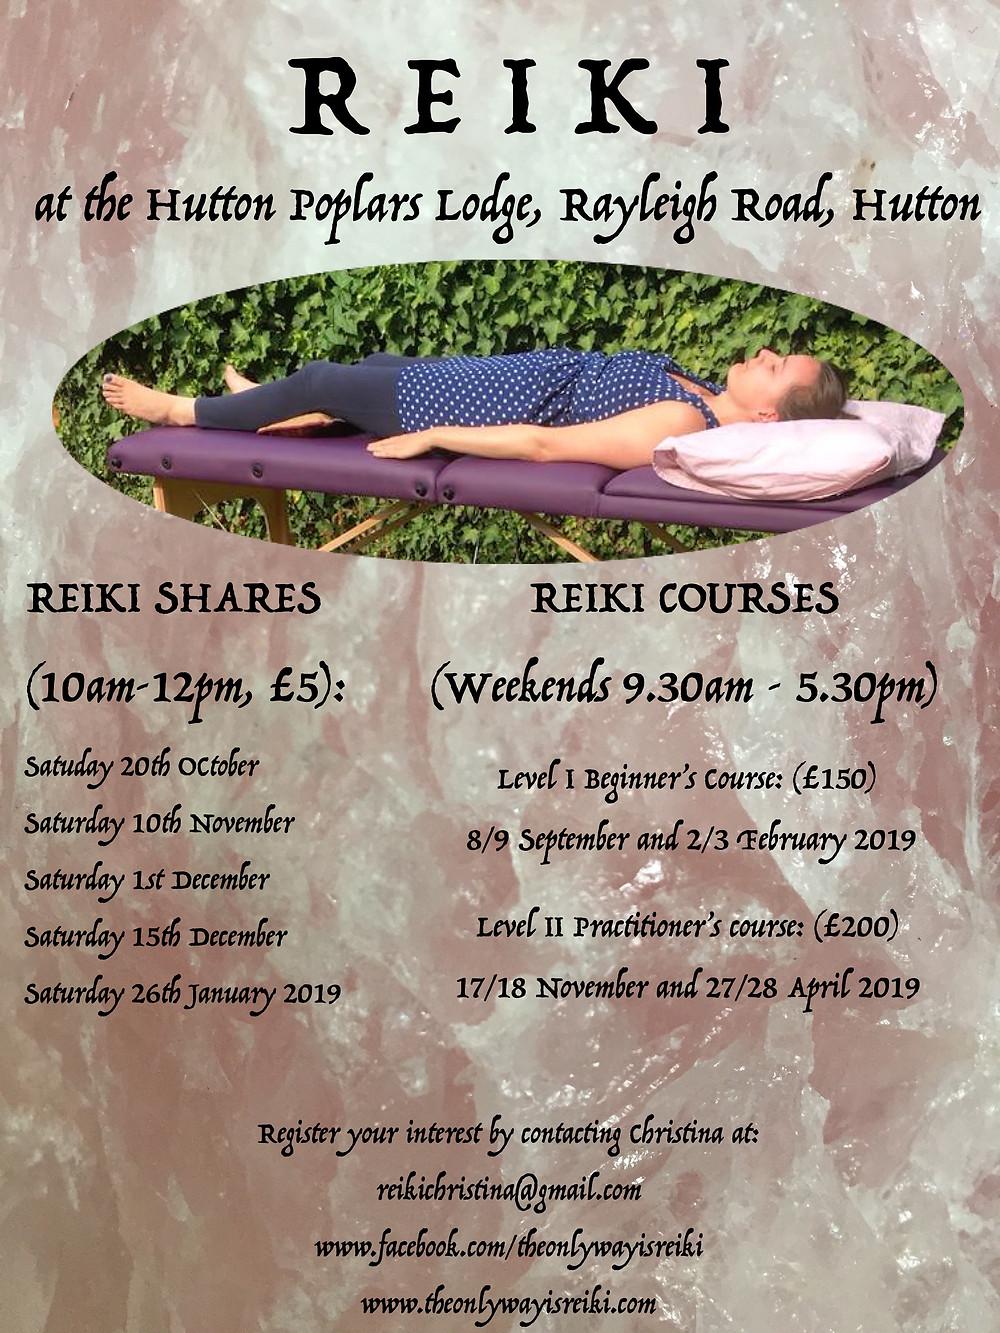 Reiki at the Hutton Poplars Lodge, Hutton, Essex